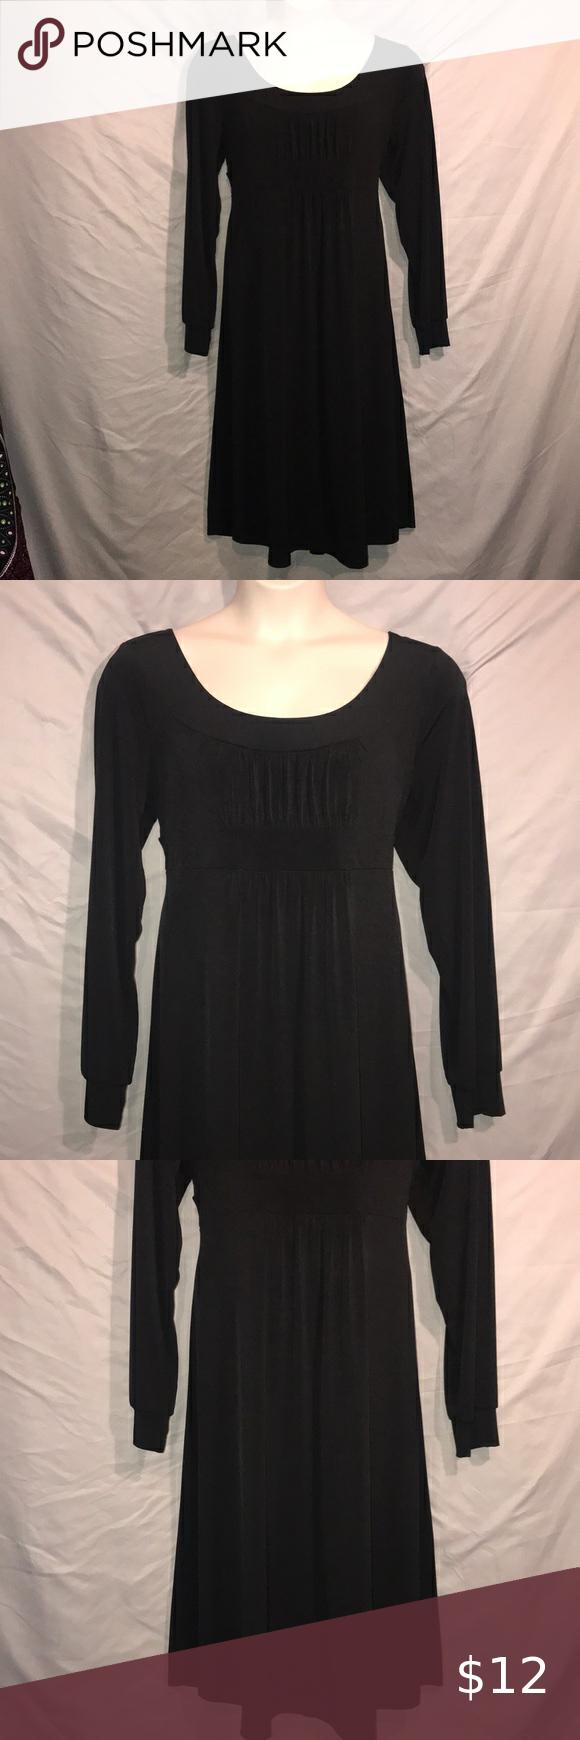 Xl Xxl Dress Dialogue Black Dress Black Dress Dresses Clothes Design [ 1740 x 580 Pixel ]